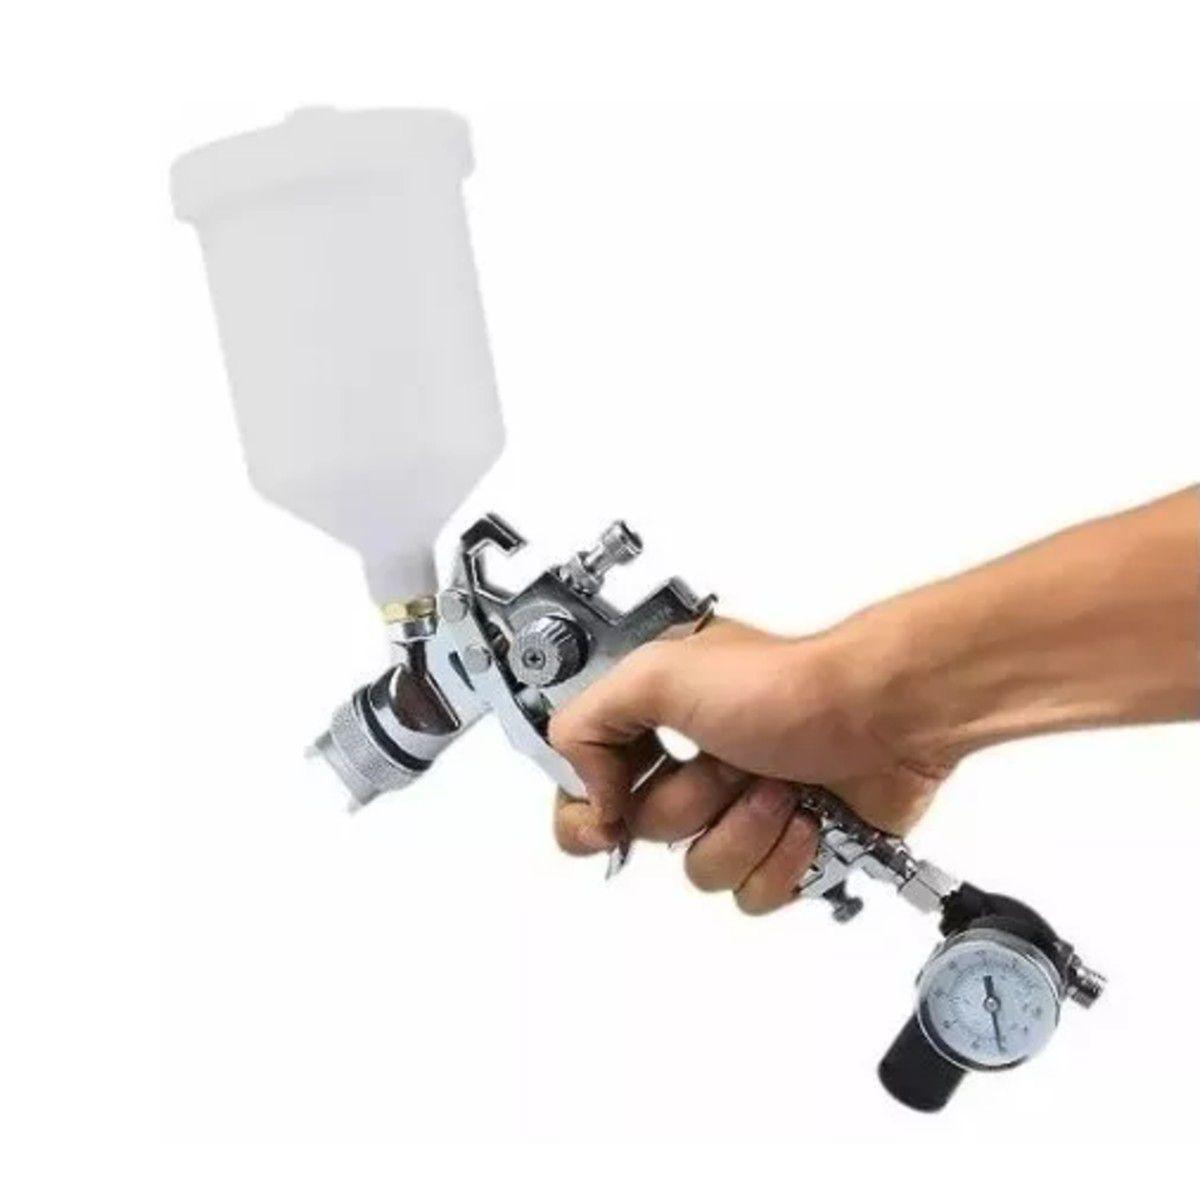 Pistola De Pintura Hvlp Bico 1,4 E 1,7 Mm Caneca 600ml Arcom